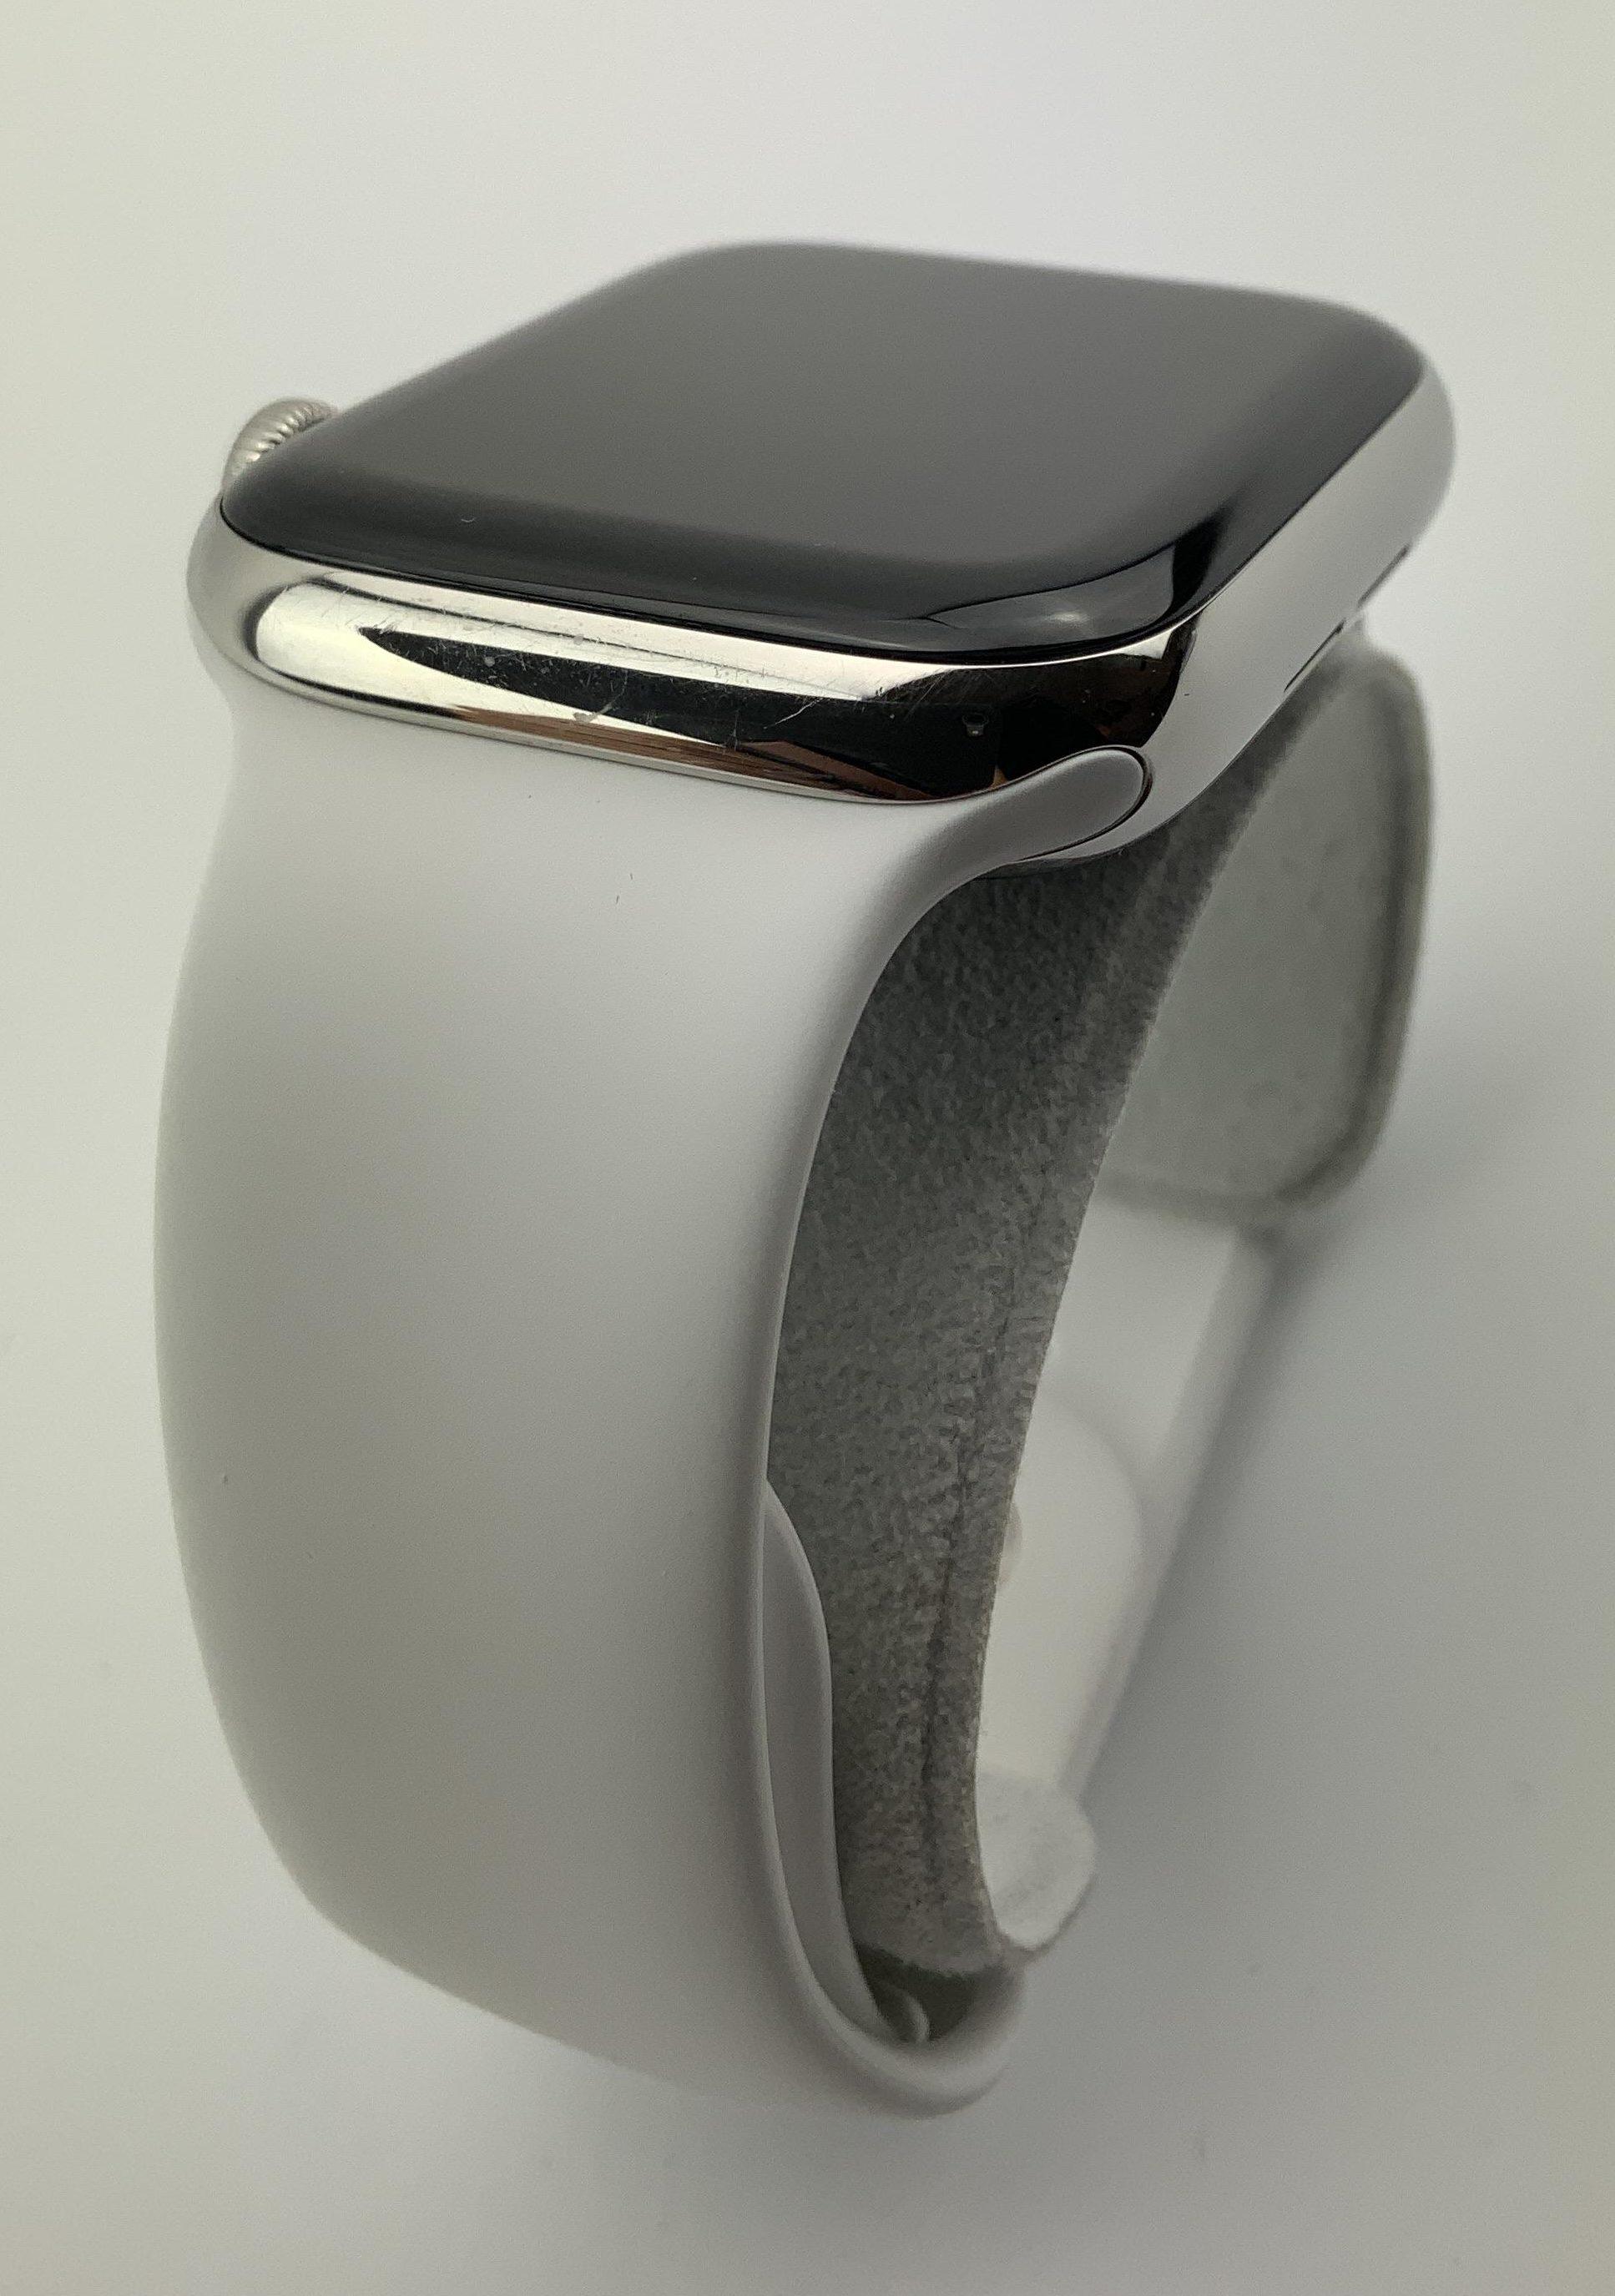 Watch Series 5 Steel Cellular (44mm), Silver, Afbeelding 4